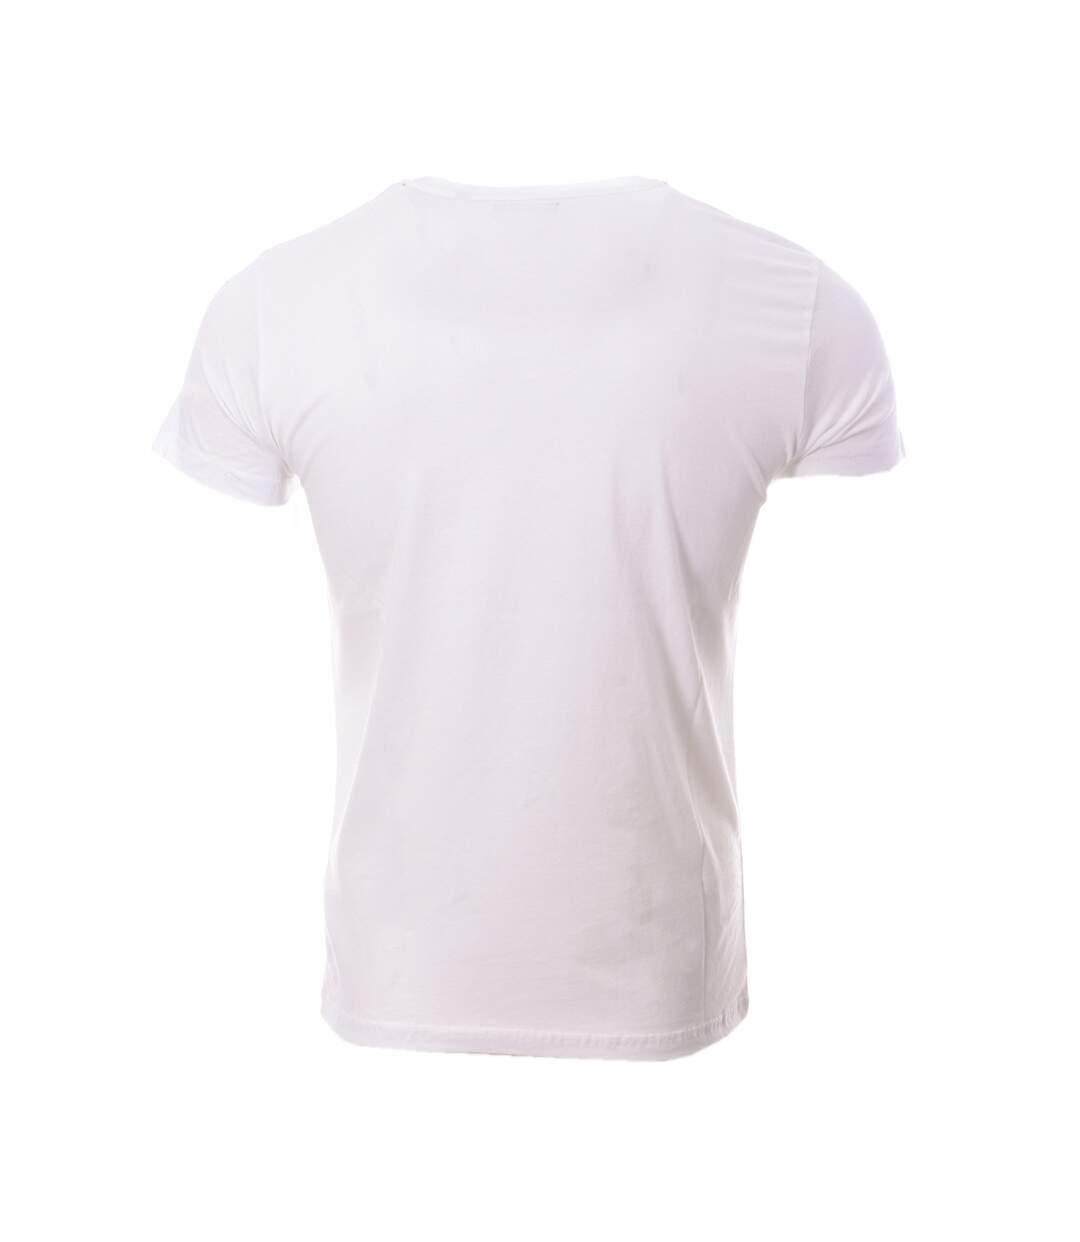 T-shirt Blanc Homme Schott Bobby